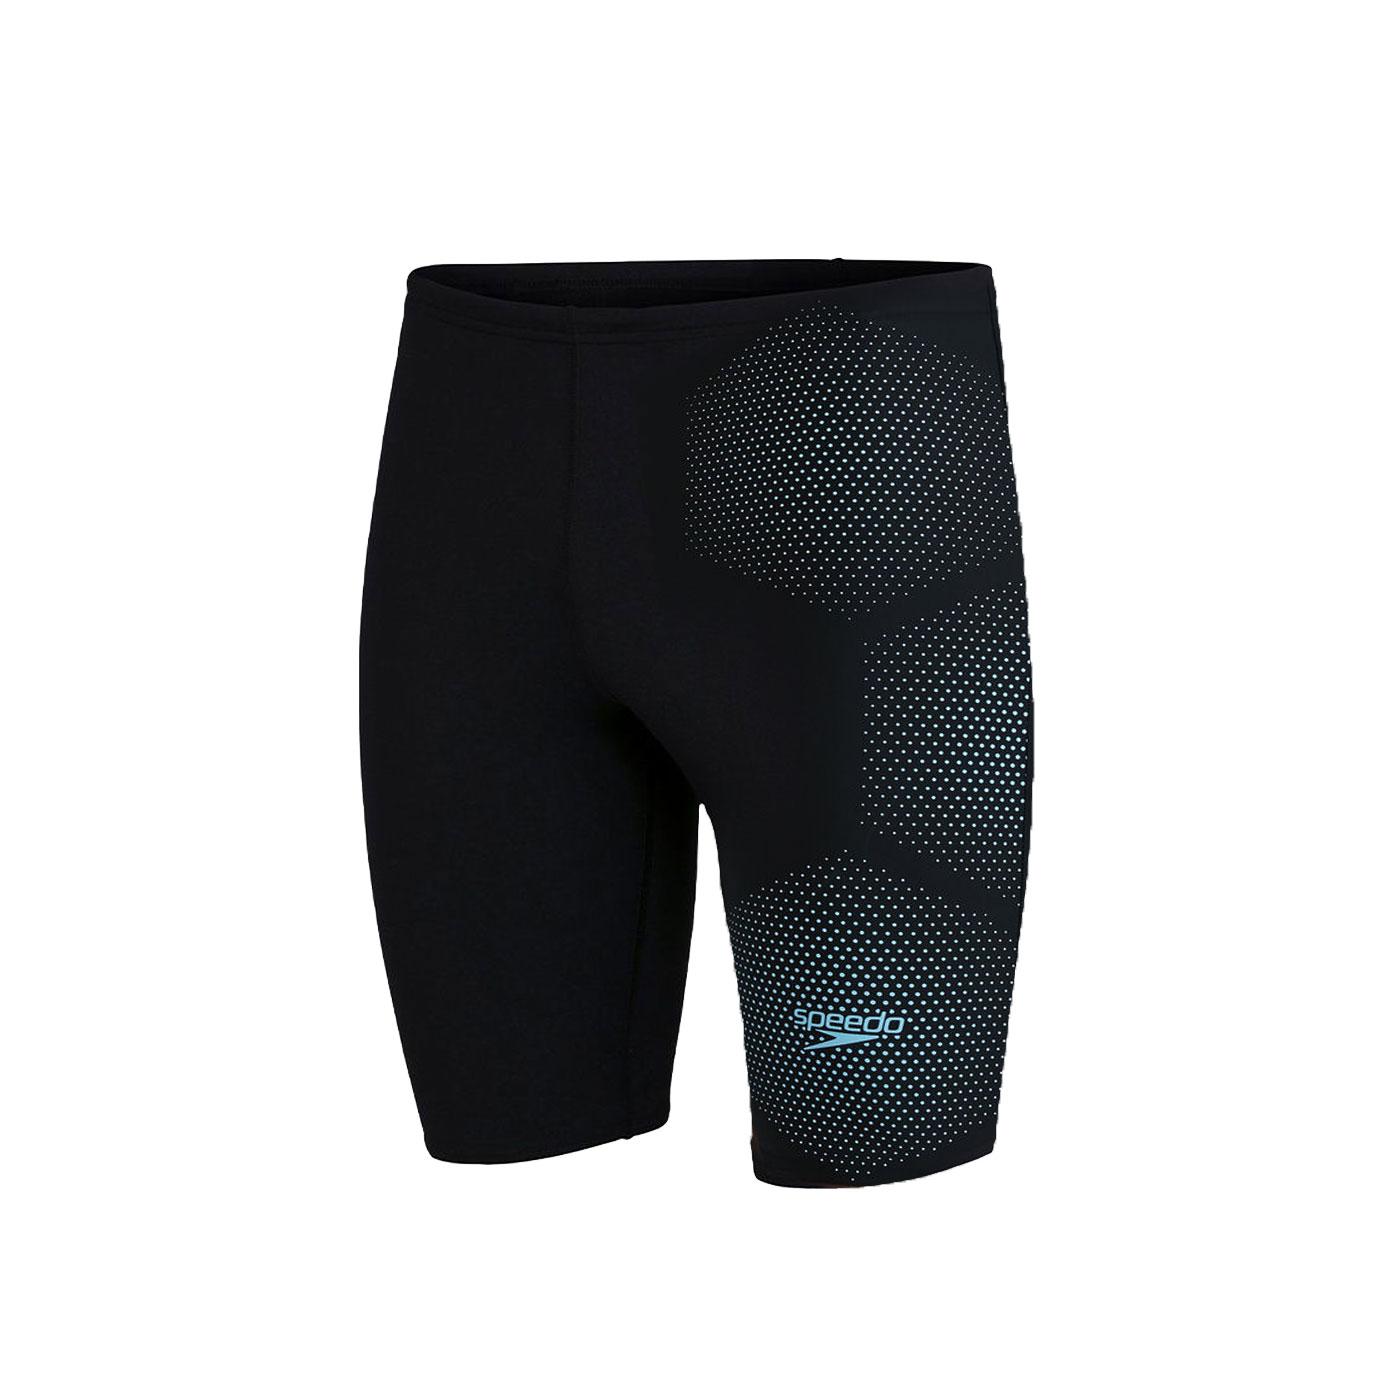 SPEEDO 男運動及膝泳褲 SD811355F888 - 黑水藍